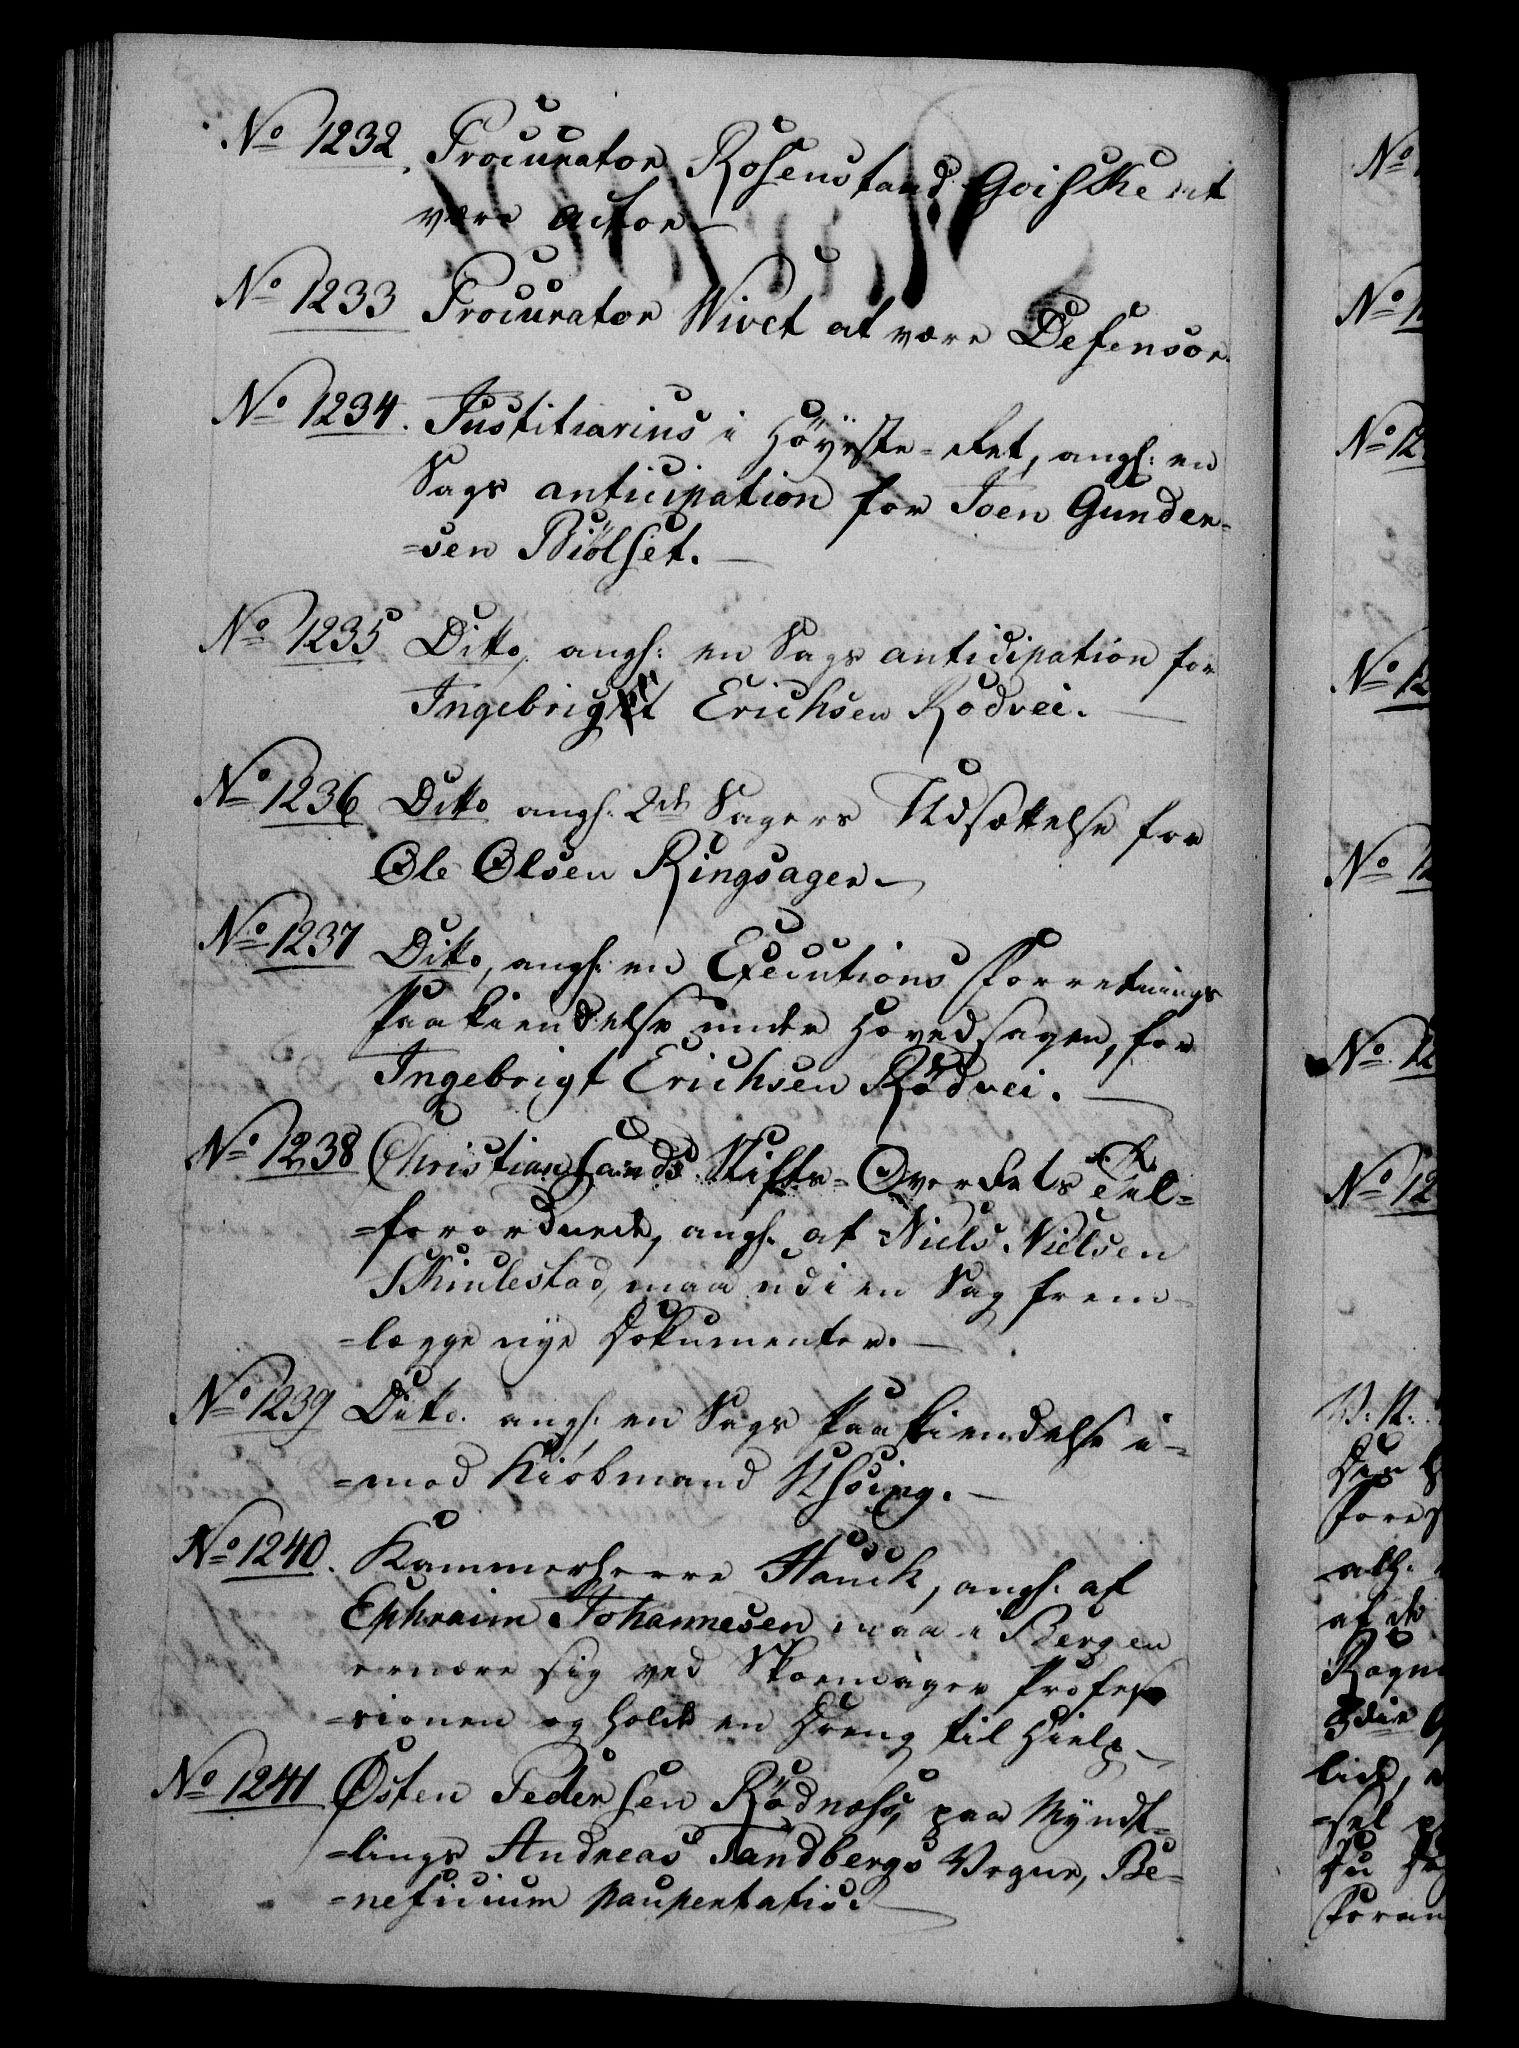 RA, Danske Kanselli 1800-1814, H/Hf/Hfb/Hfba/L0001: Registranter, 1800-1801, p. 345b